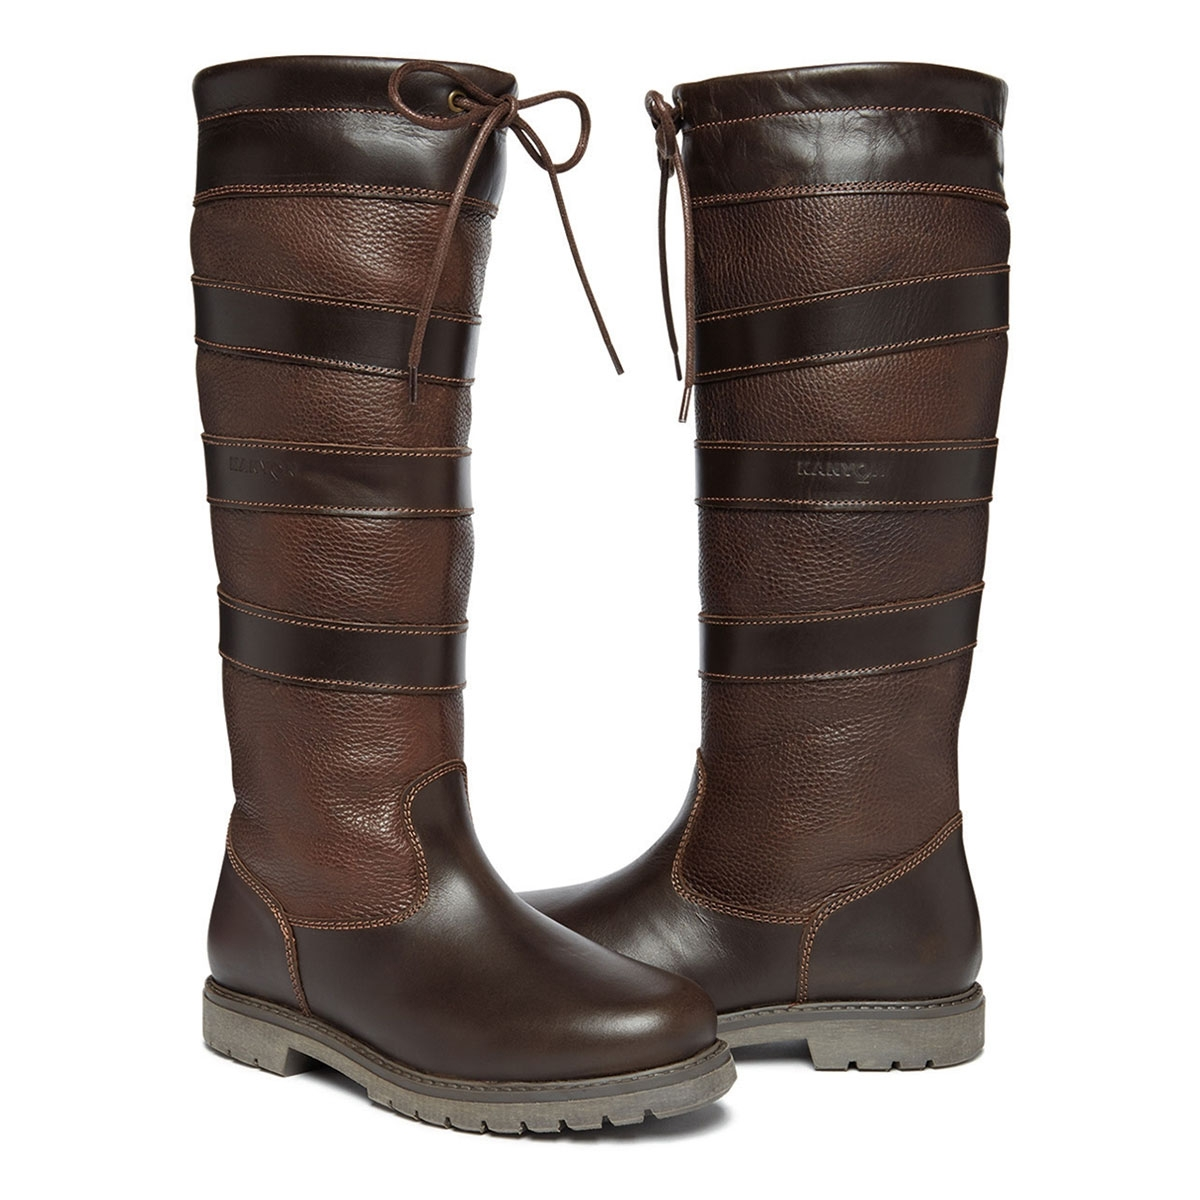 Kanyon Outdoor Rowan 2 WP Country Boots - Standard Calf (Women's)